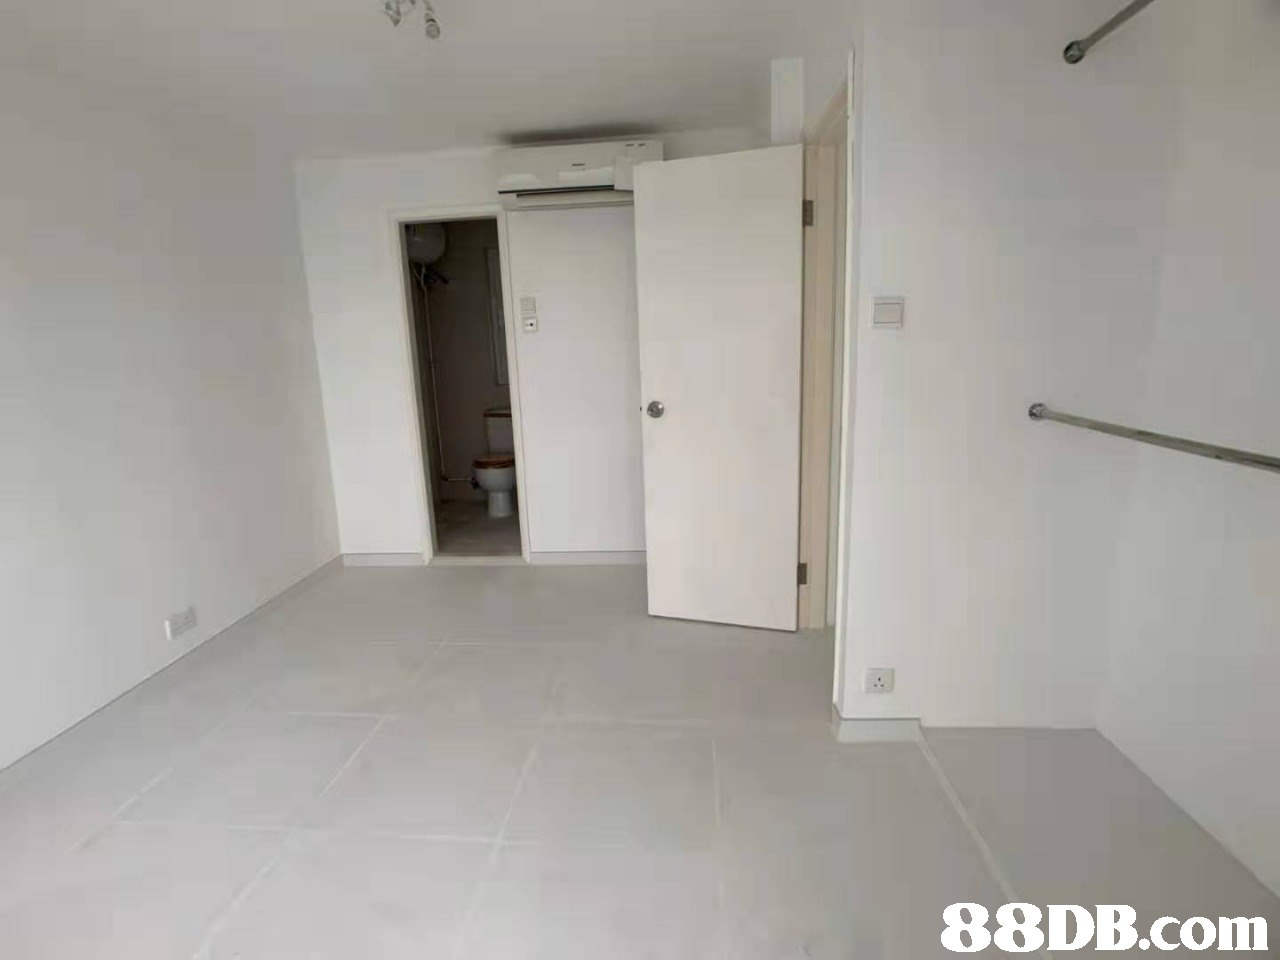 Property,Room,Floor,Building,Ceiling